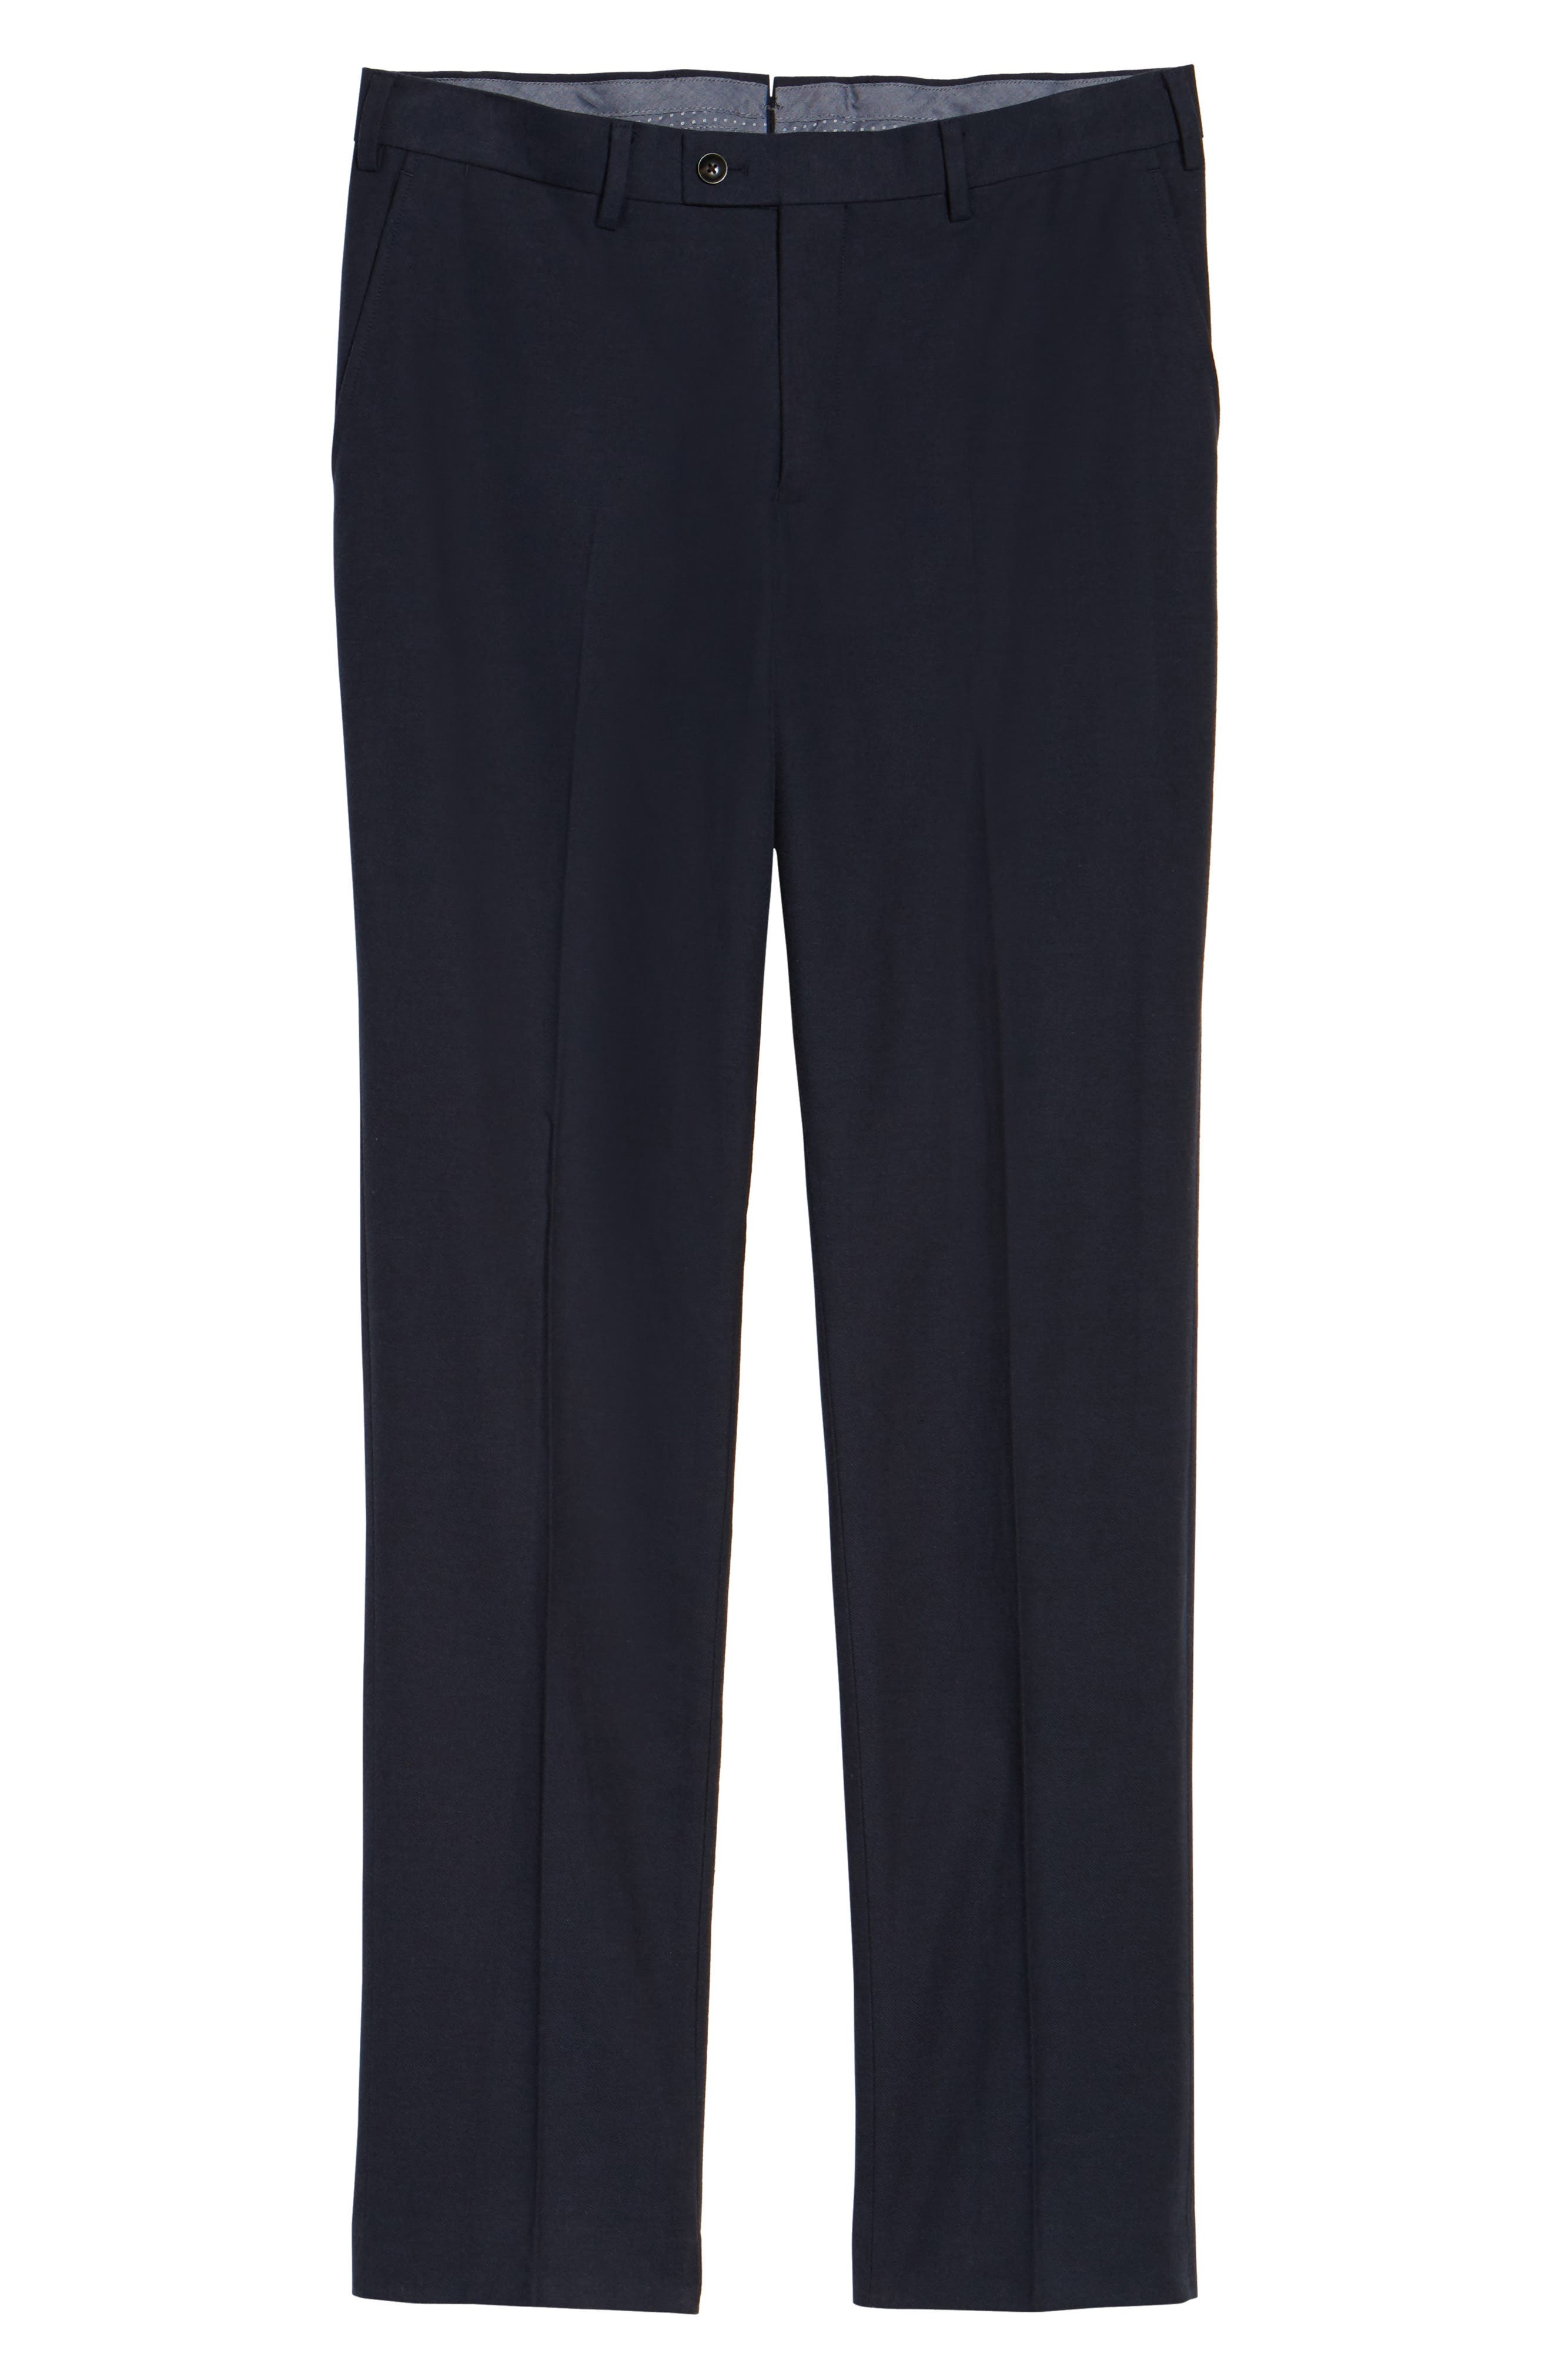 Pembroke Slim Fit Twill Pants,                             Alternate thumbnail 6, color,                             410